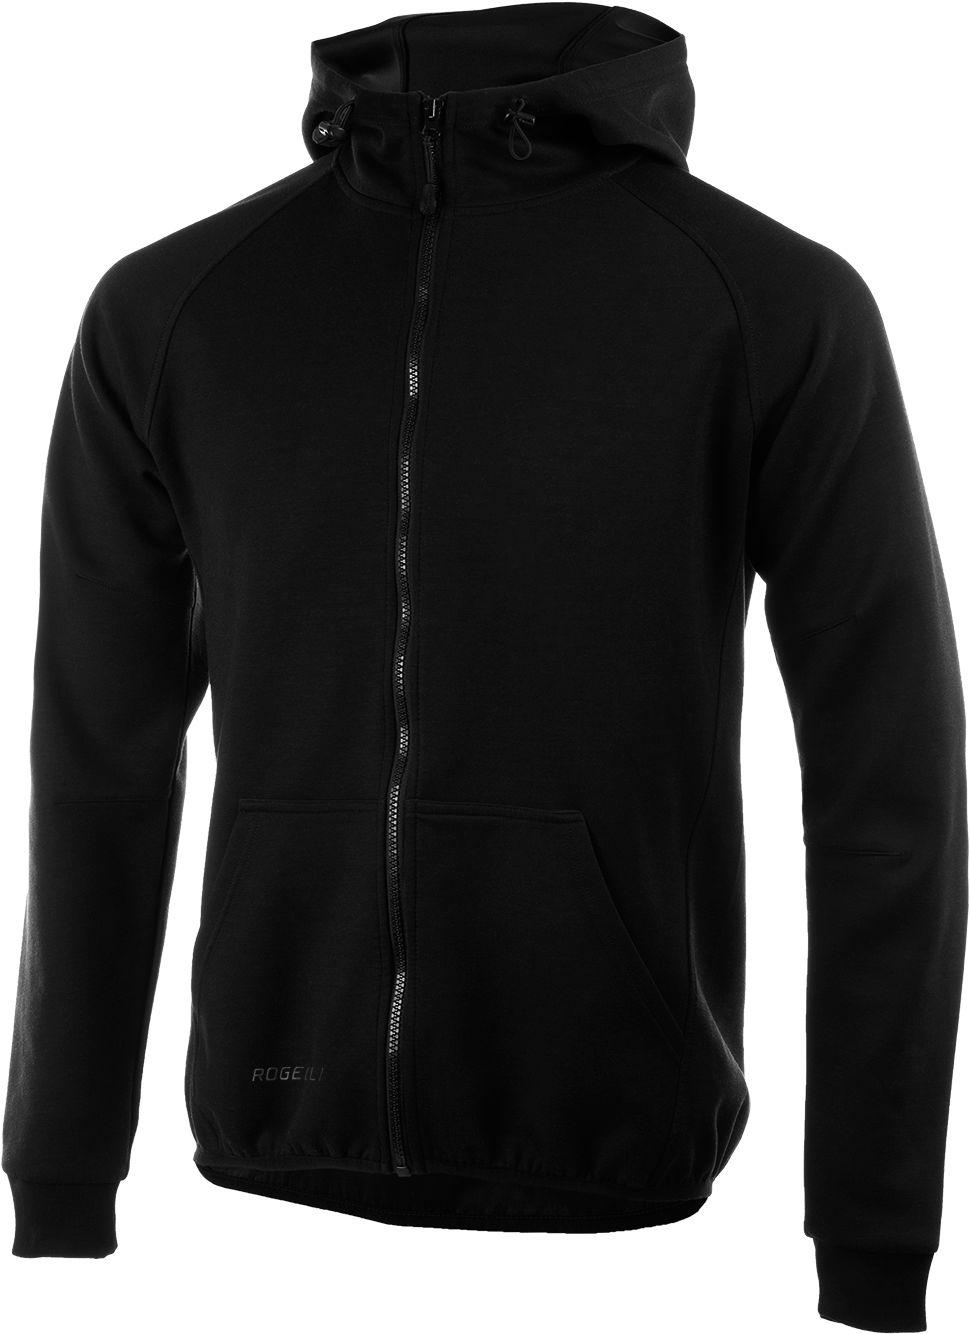 ROGELLI bluza męska z kapturem TRENING czarna Rozmiar: M,050.601.XL